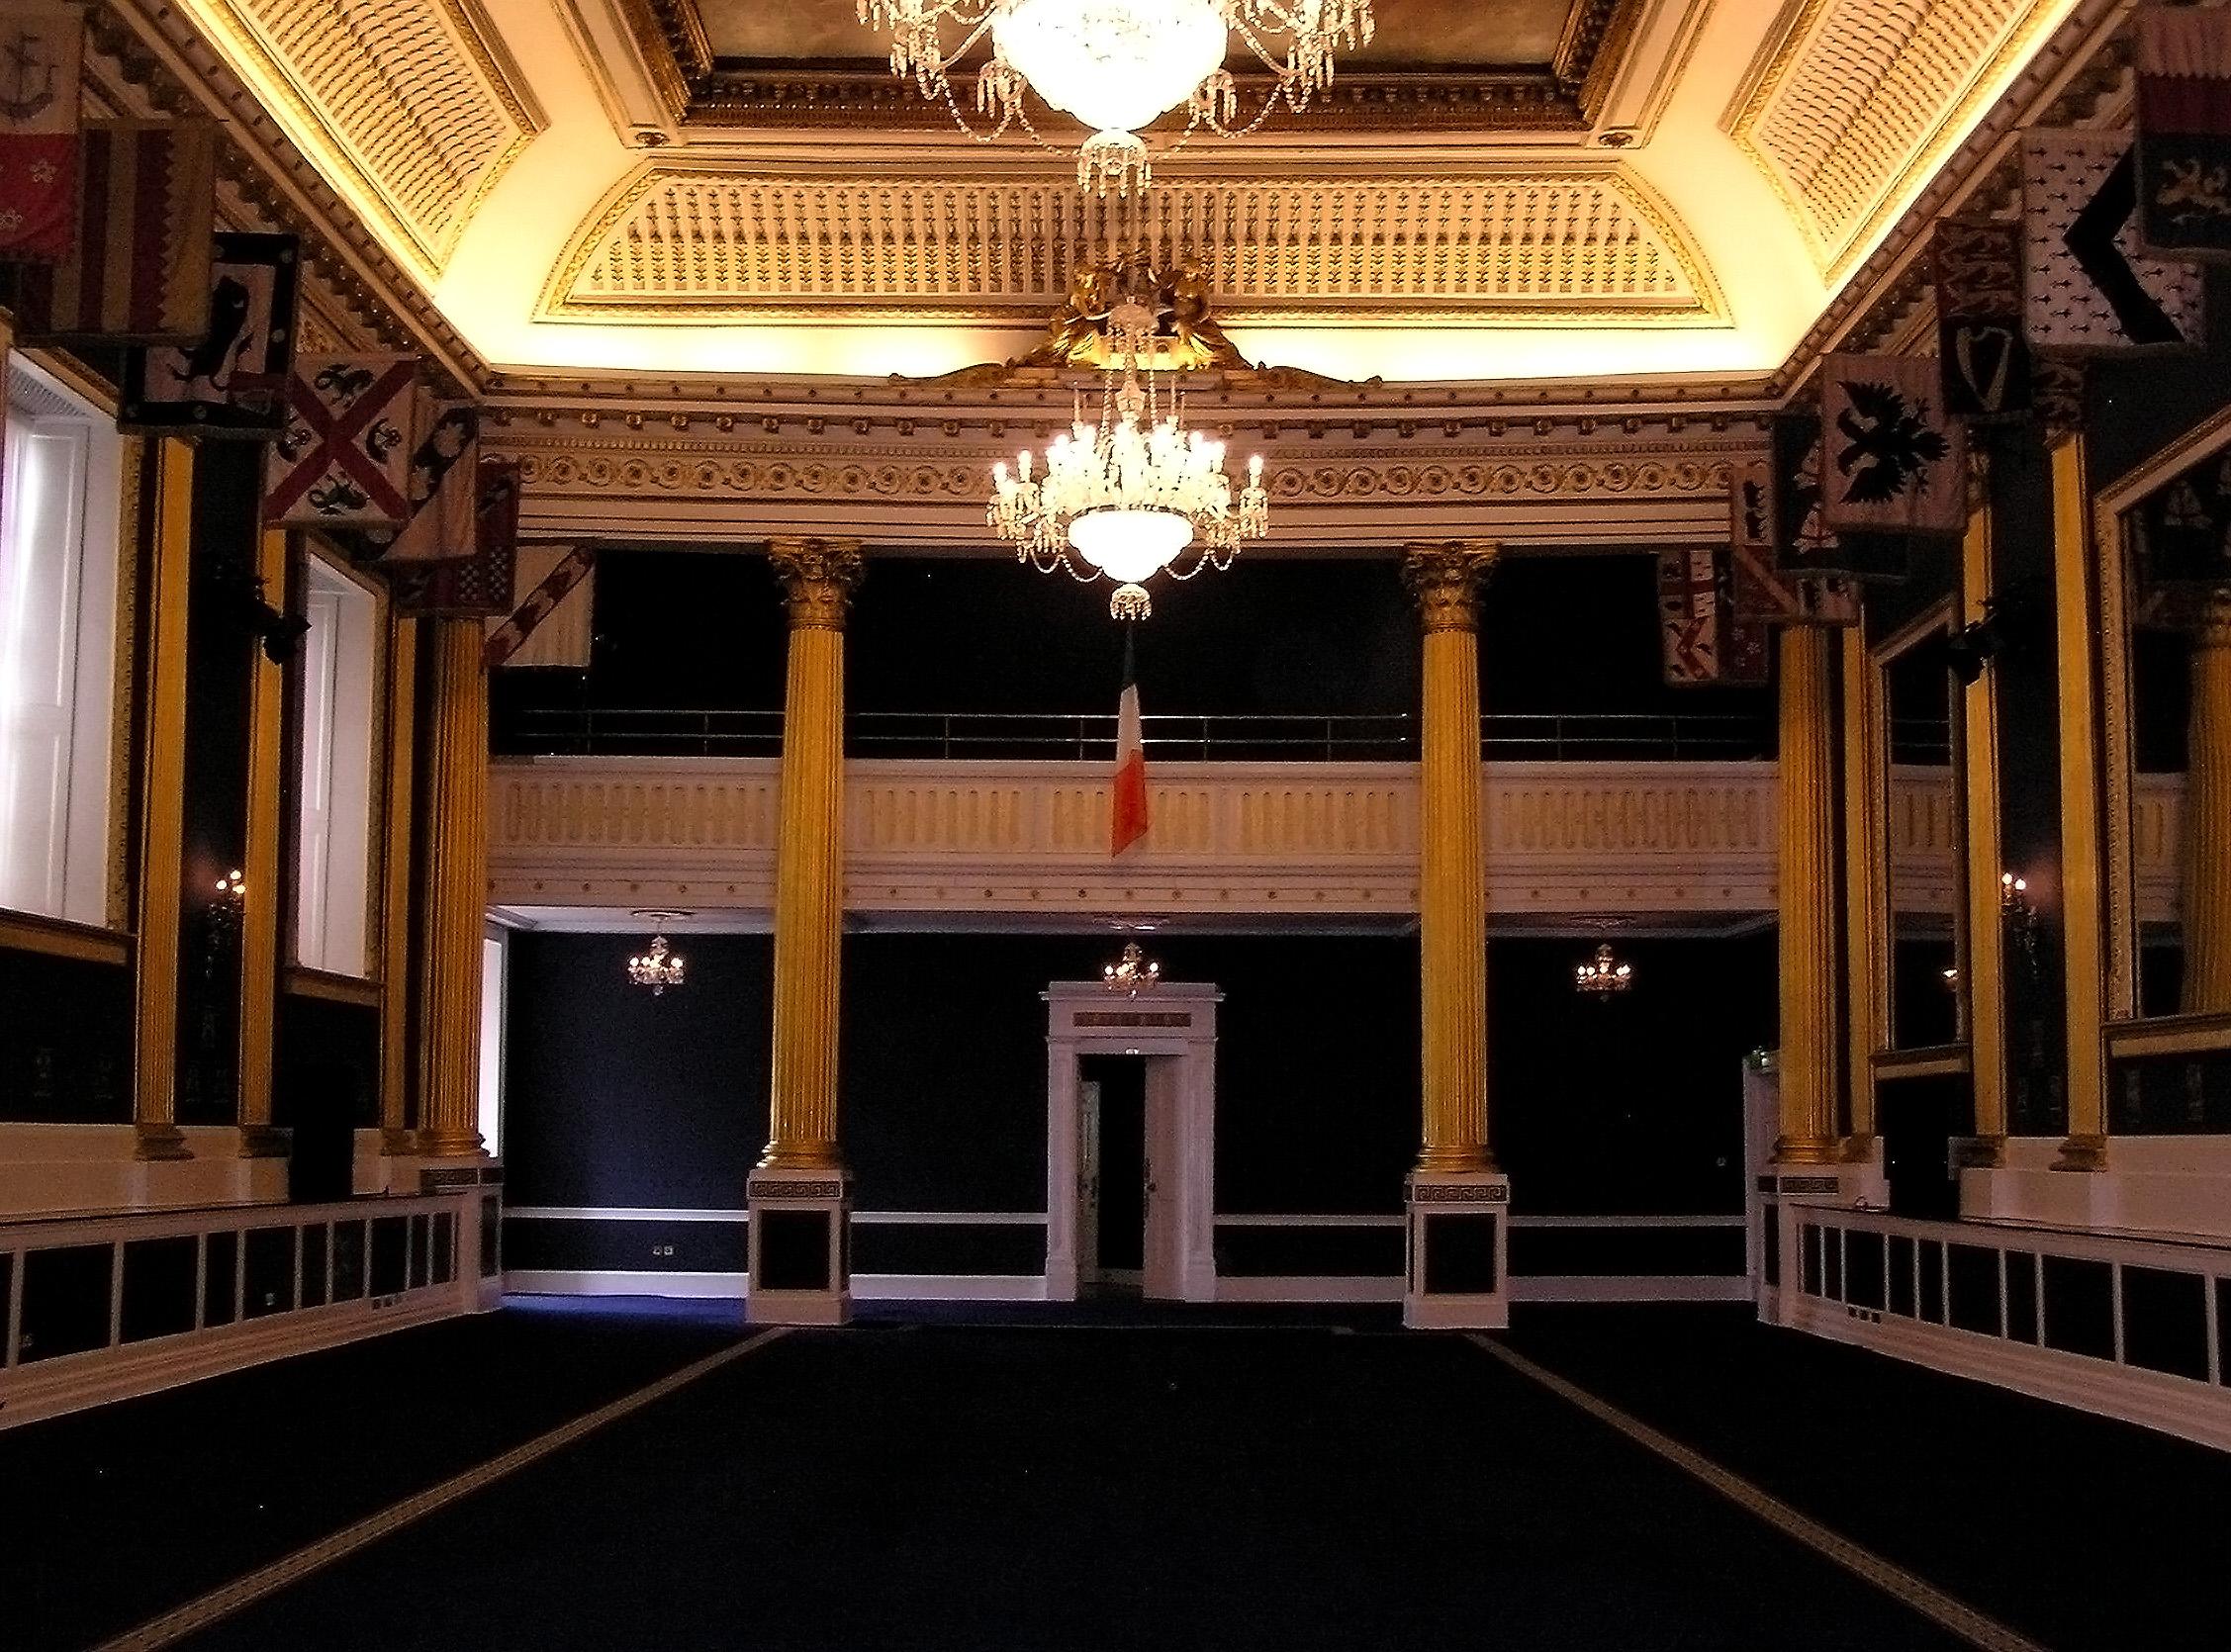 file:(ireland) dublin castle interior (st. patrick's hall)